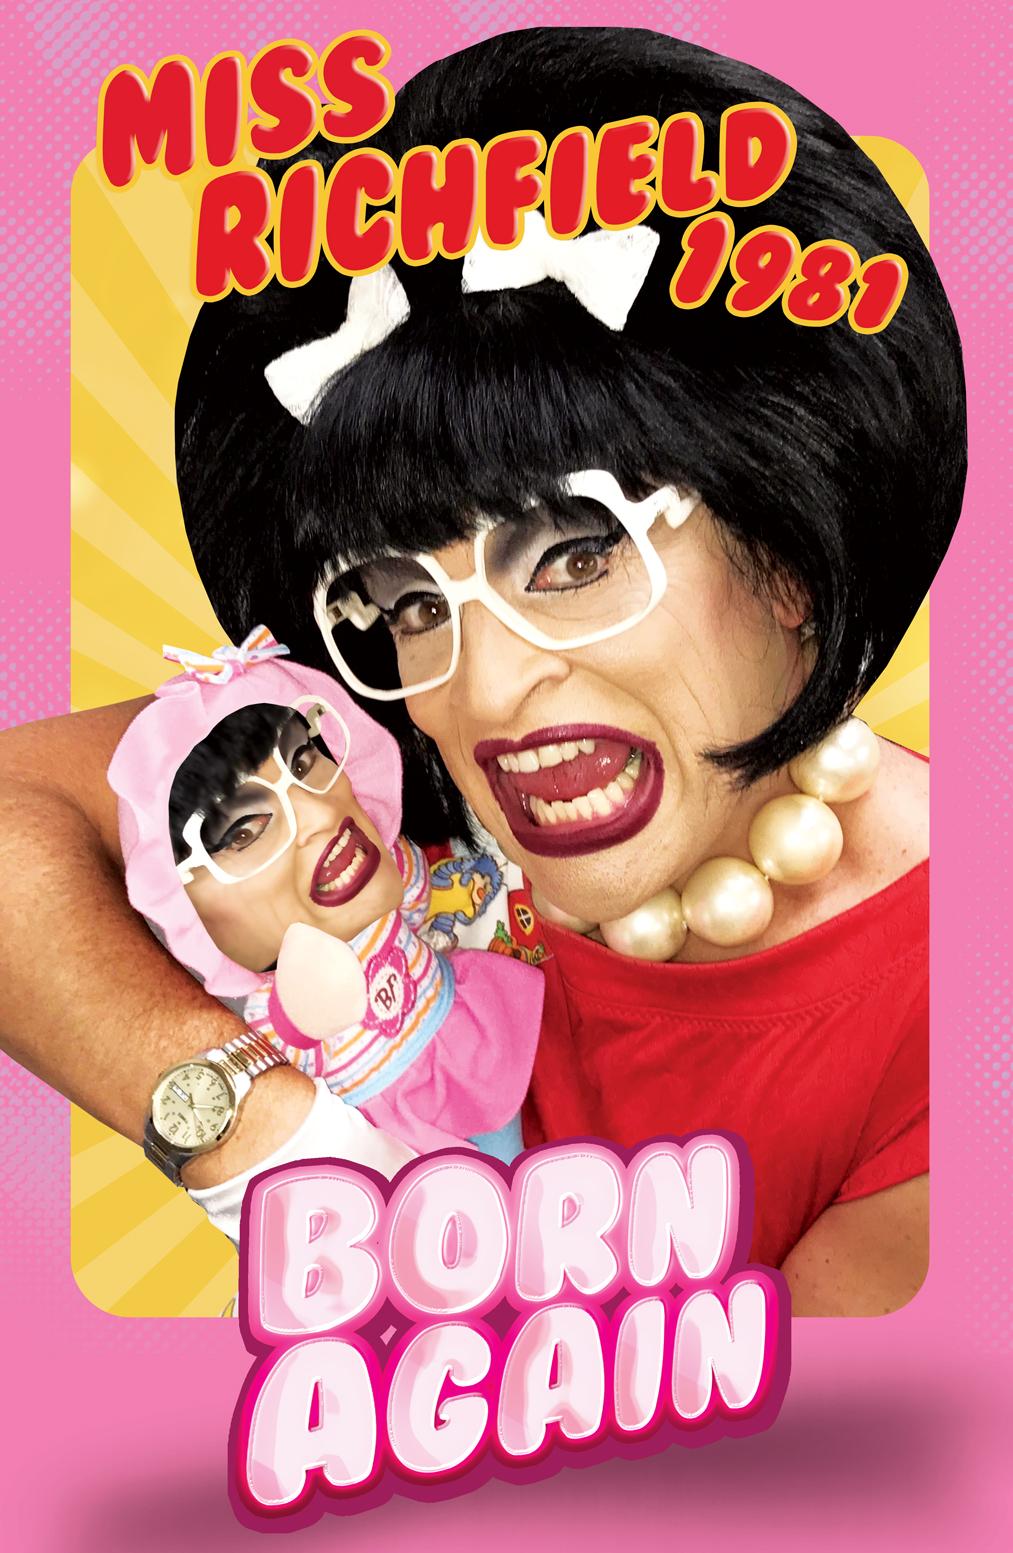 Miss Richfield 1981 is Born Again - Sneak Preview